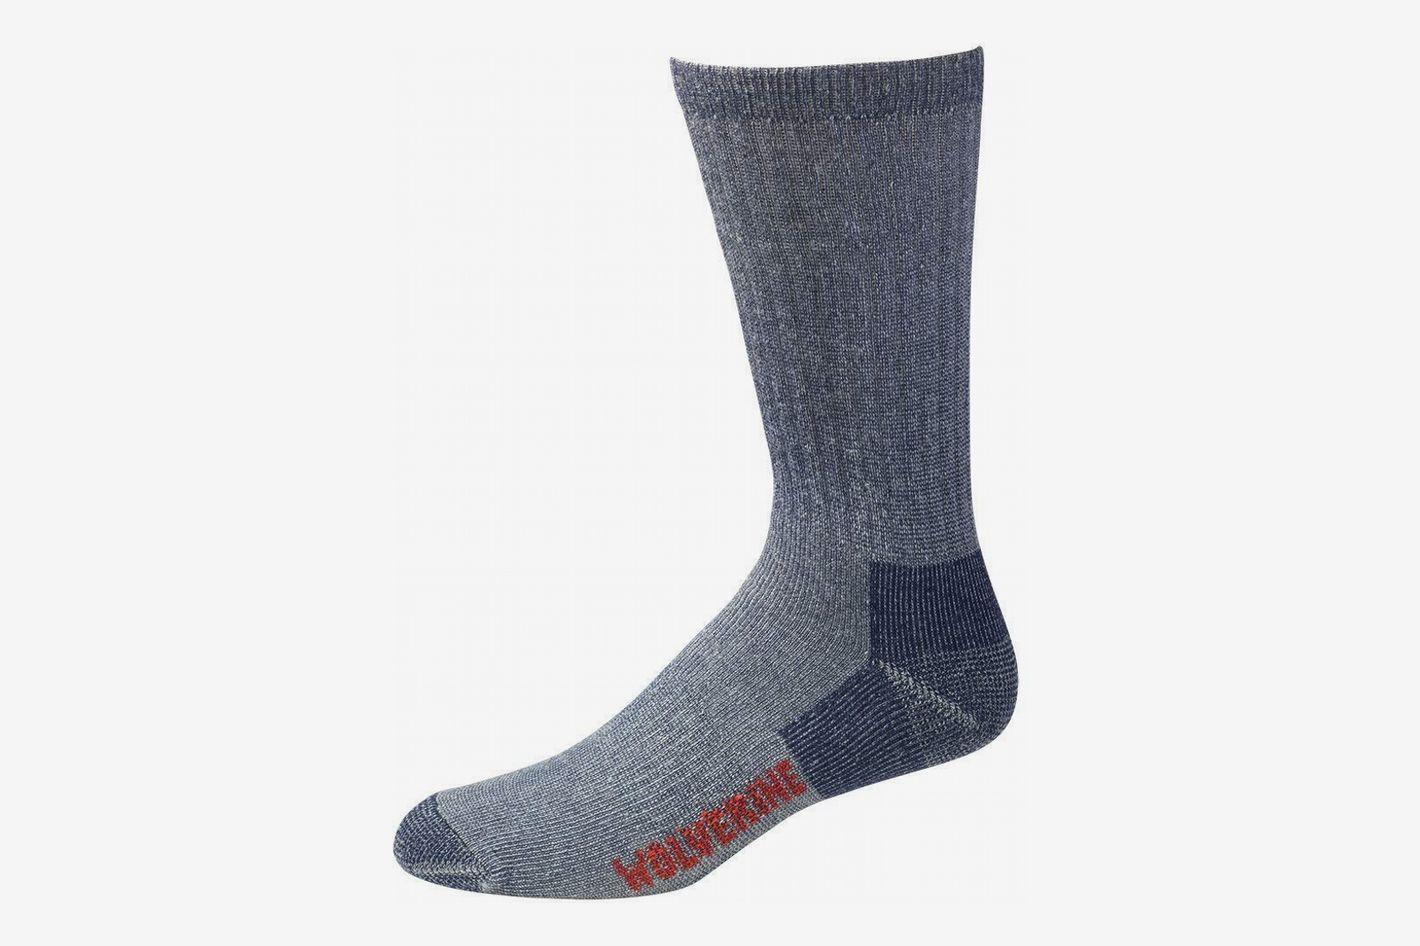 Wolverine Socks Men's 3 Pack Wool Boot Socks